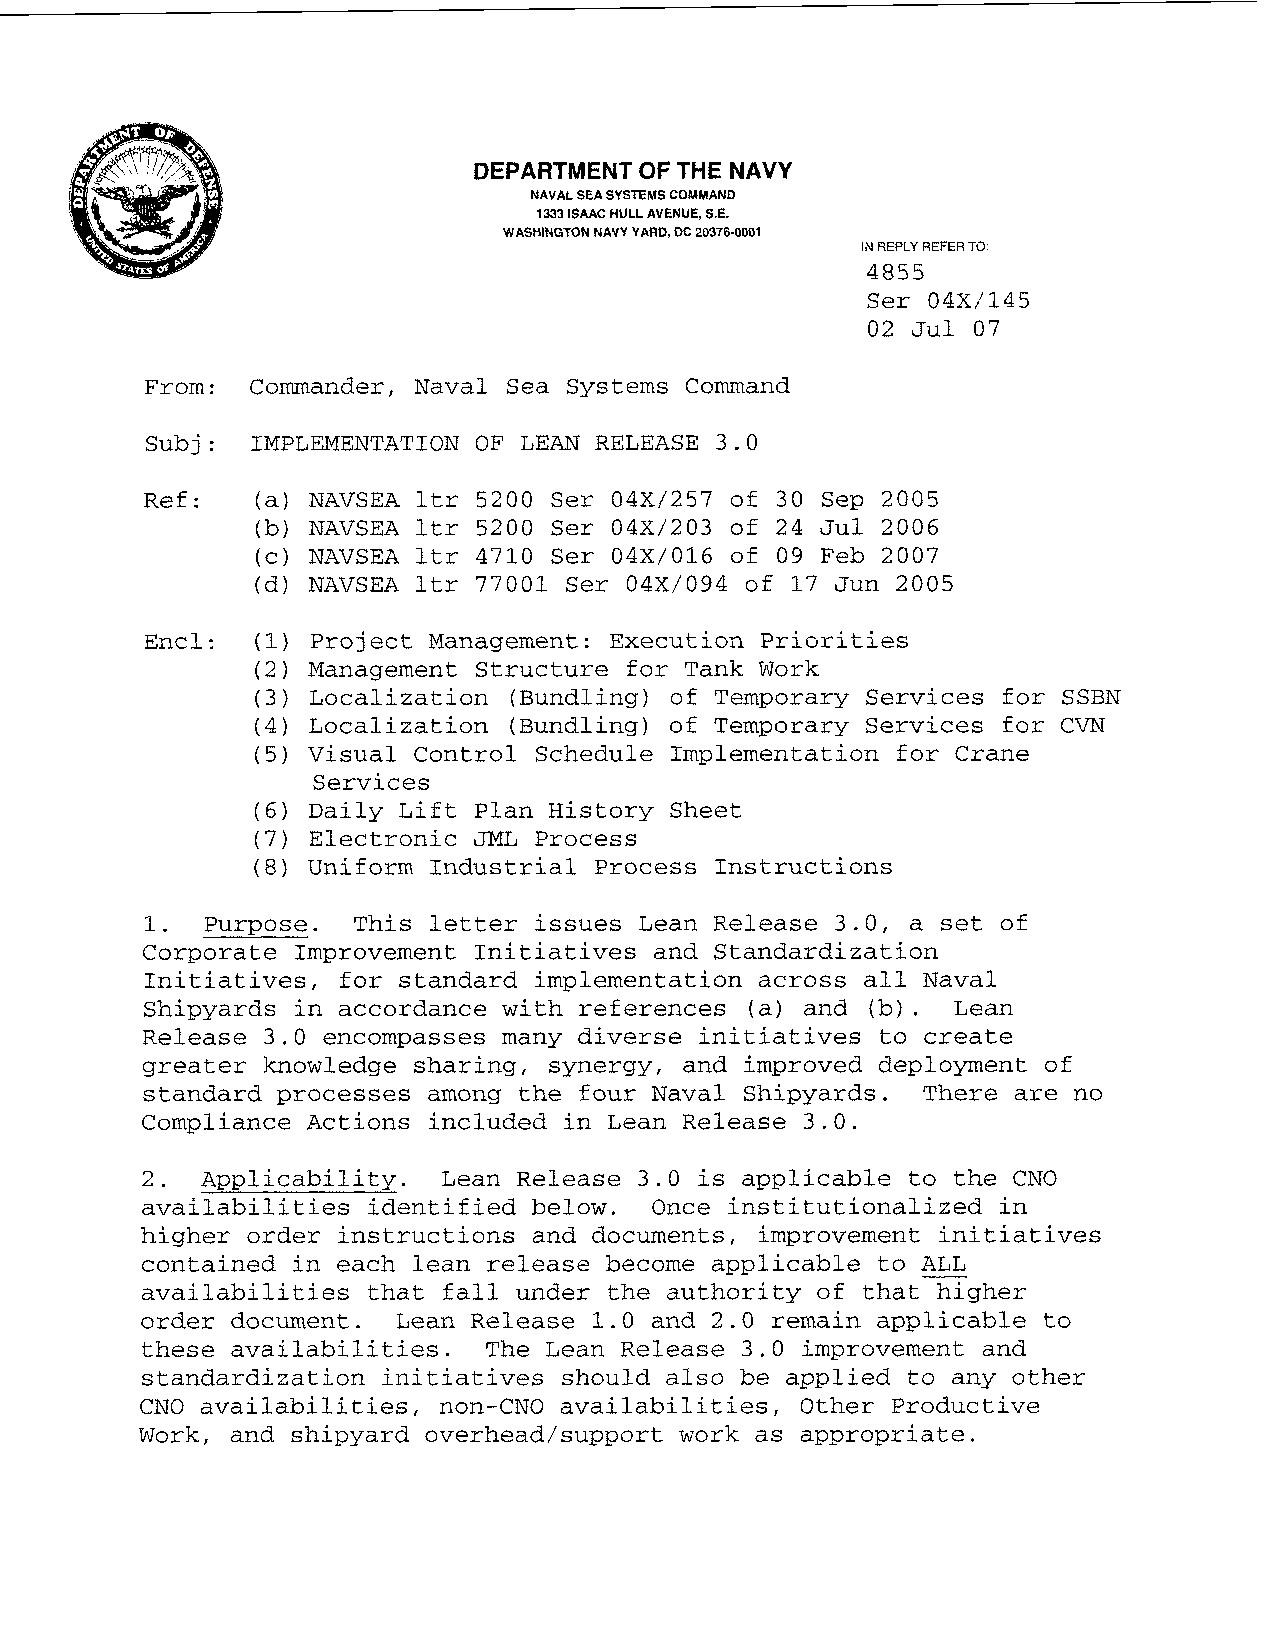 Naval Letter format Usmc Template - Naval Letter format Letterhead Copy 8 Best Navy Correspondence